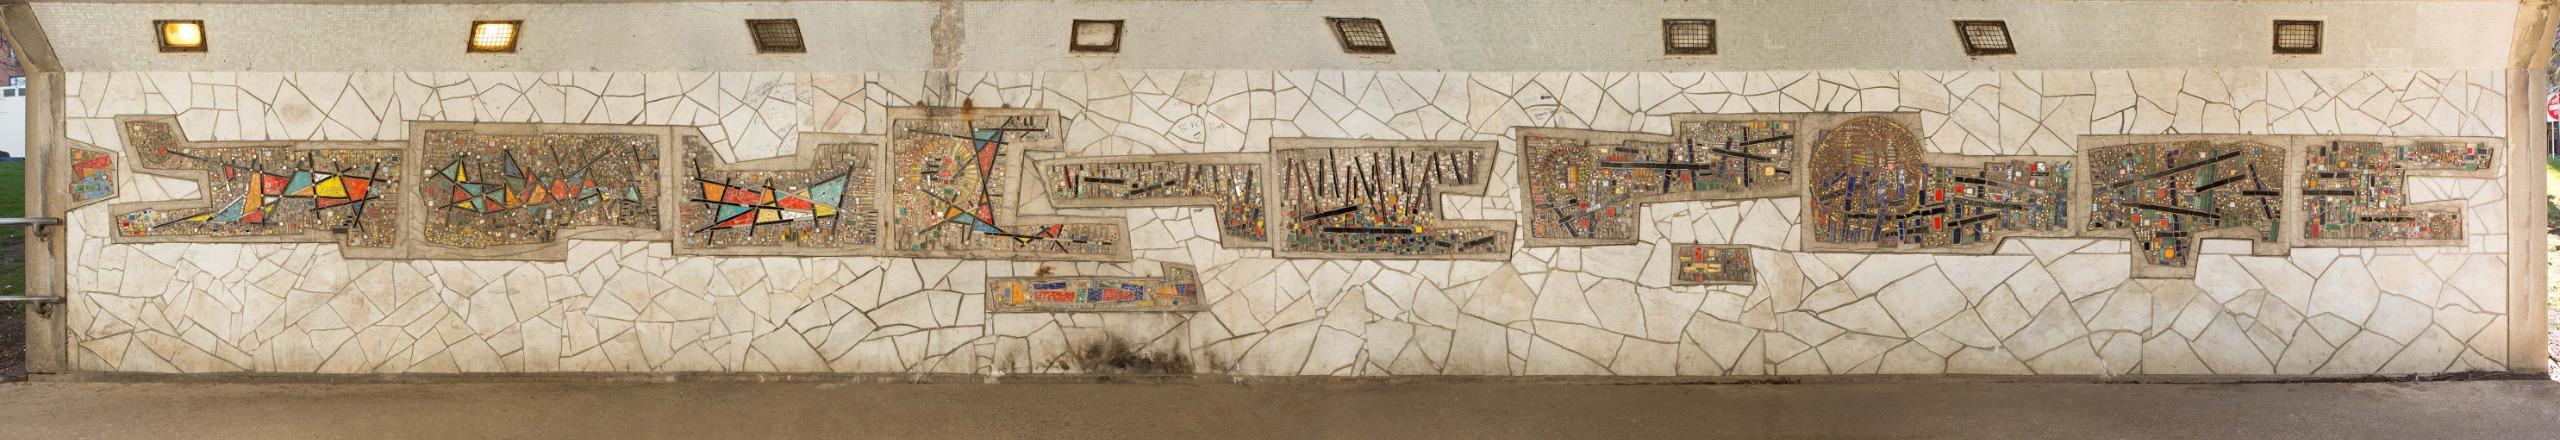 Cantini Mosaic